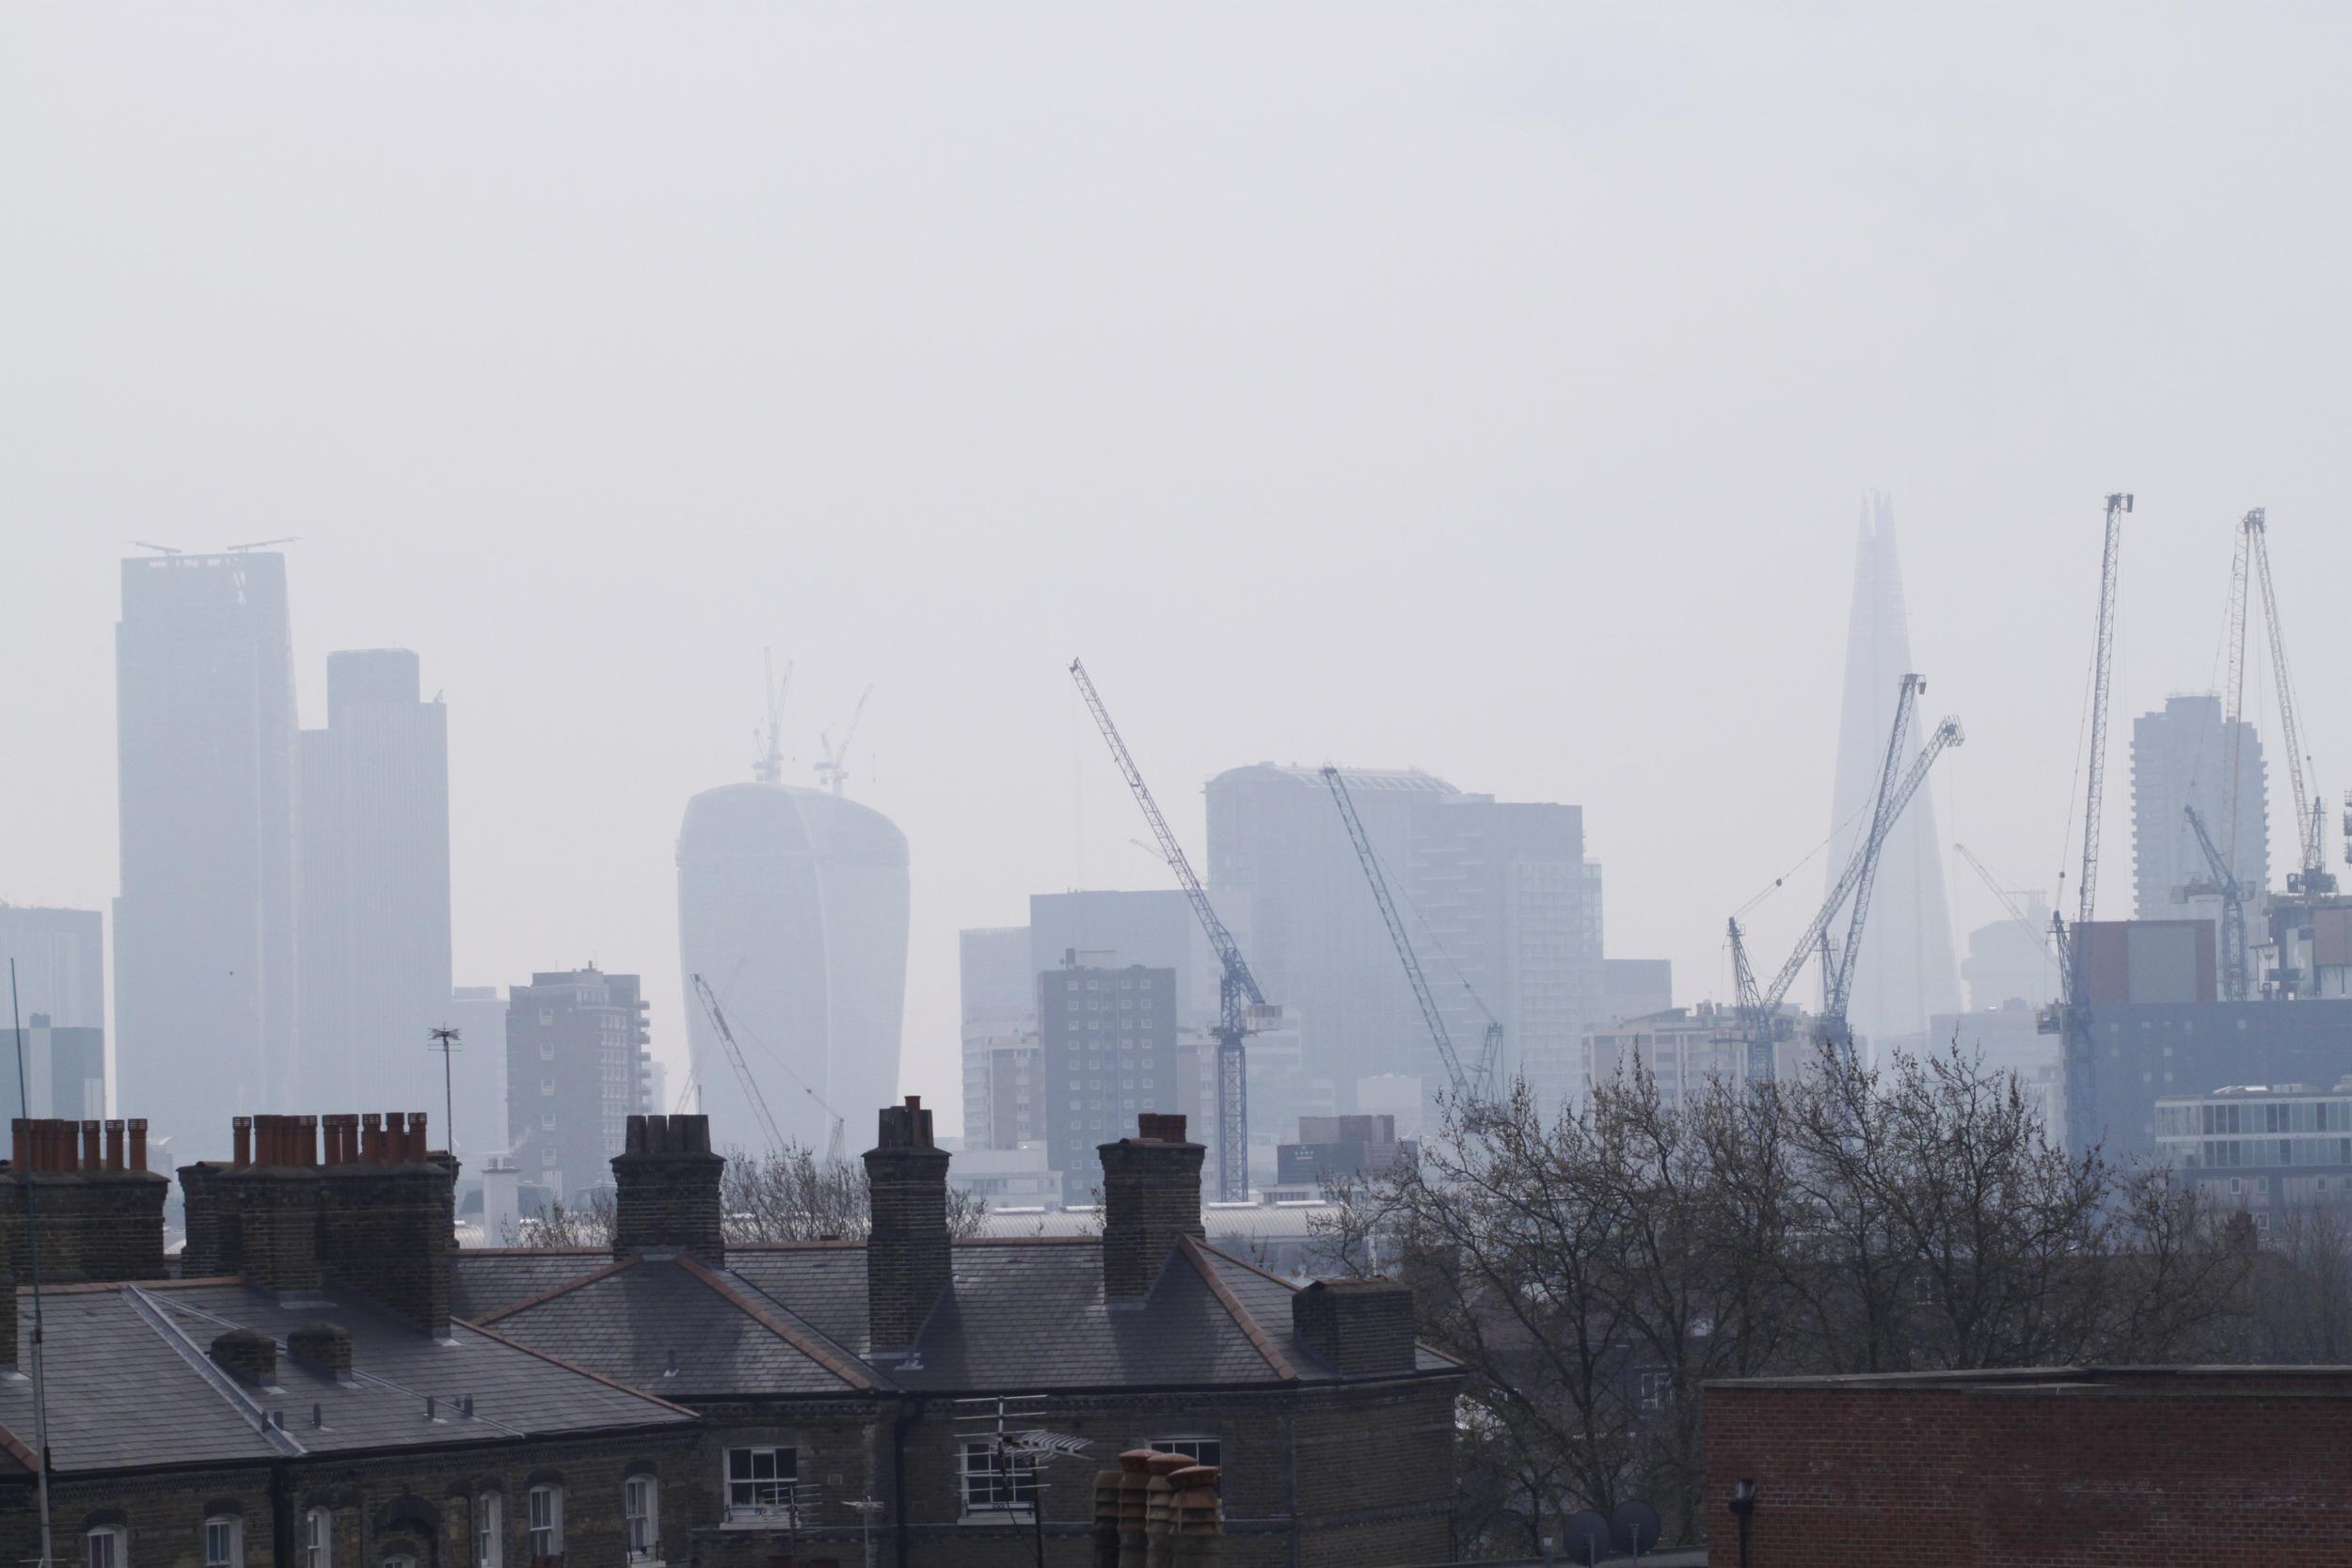 view of London in milky, hazy smog